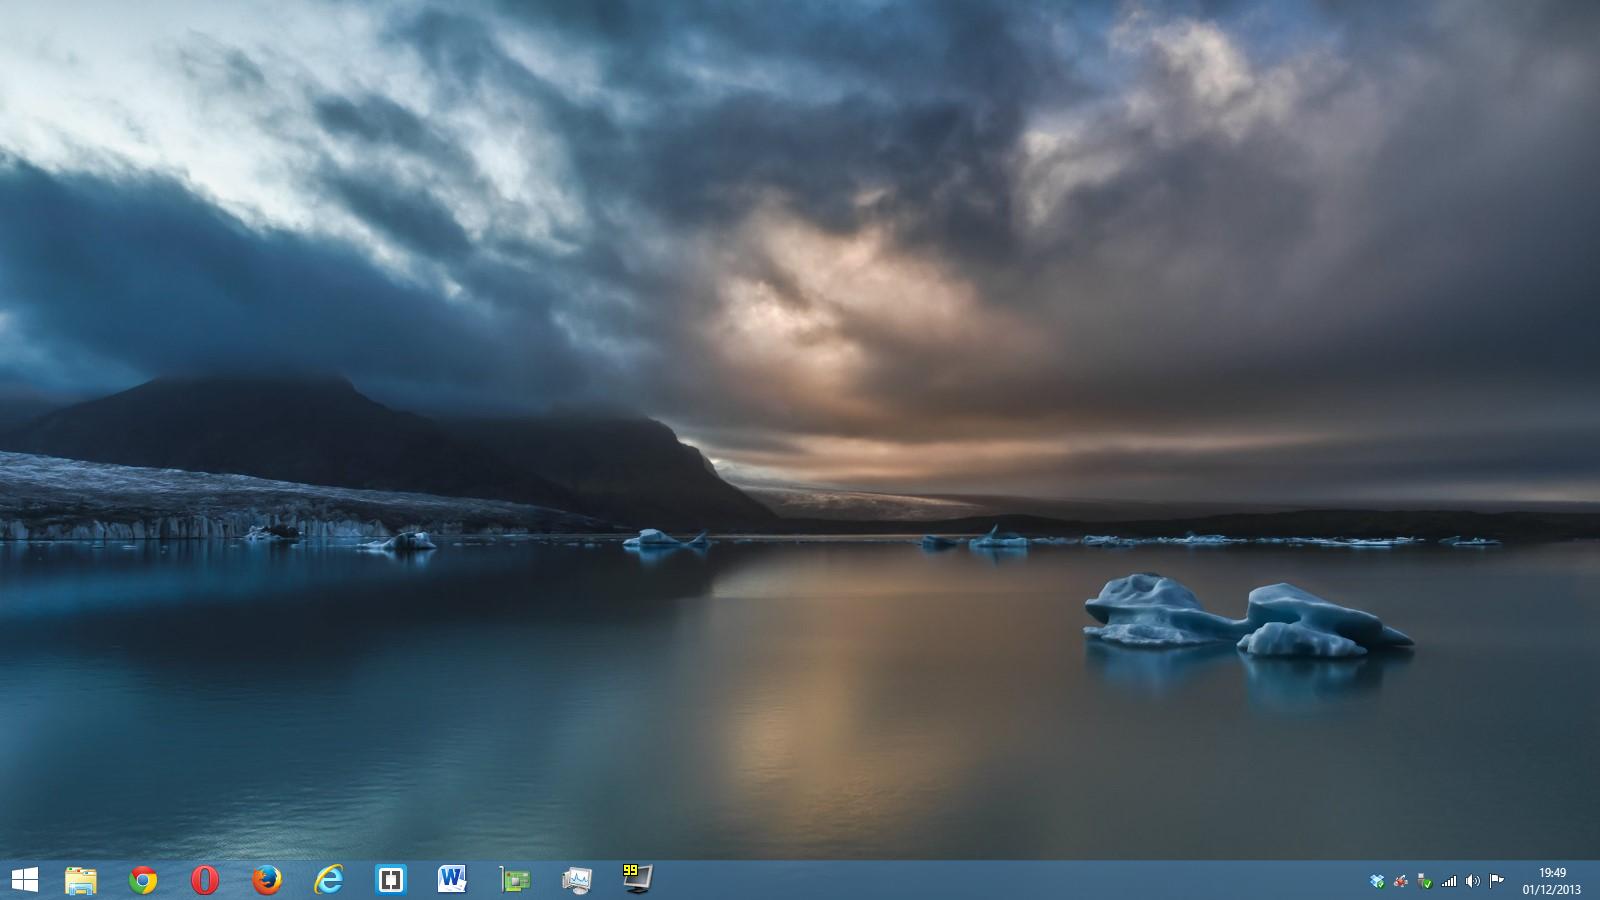 Best HD Wallpapers Windows 8 1 1024x576 Px 8VQ49WF Source December 2013 Desktops General Discussion Neowin